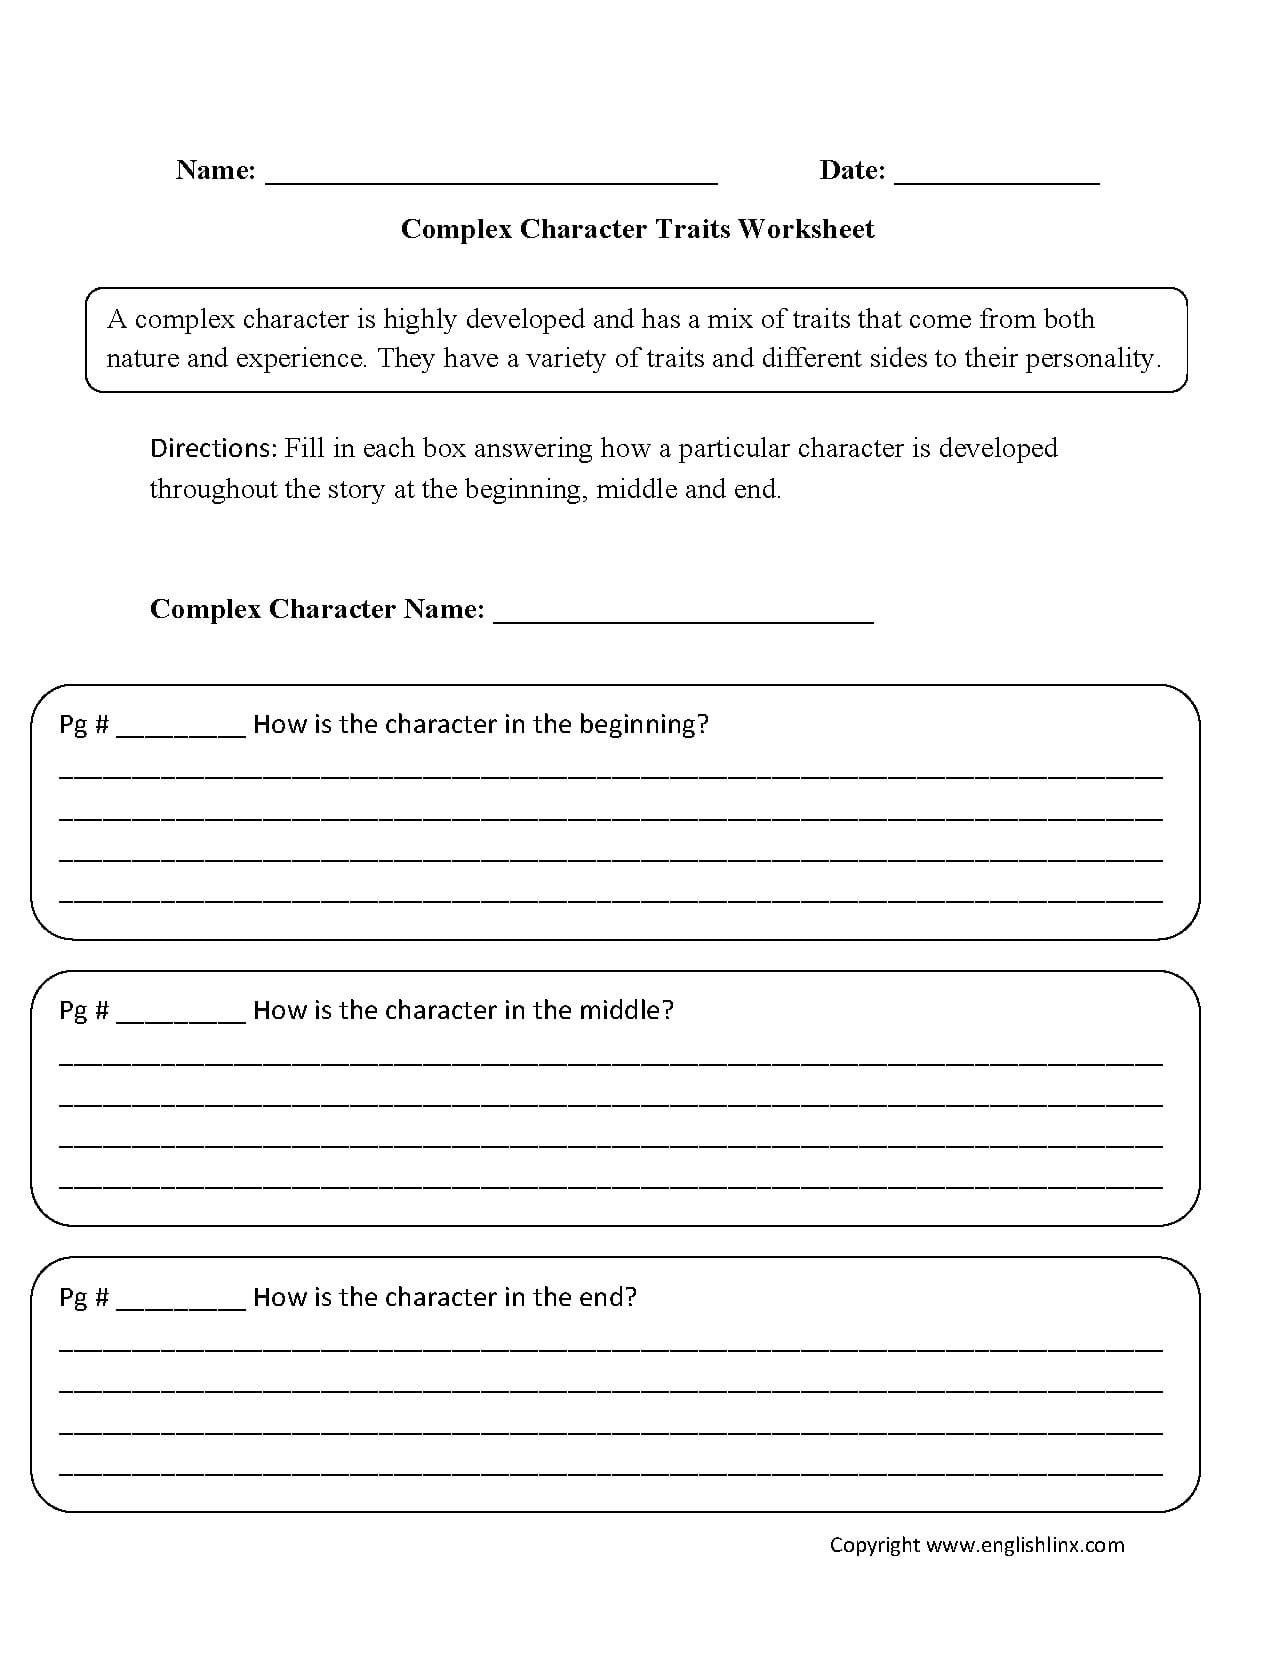 Reading Worksheets  Character Traits Worksheets For Character Traits Worksheet 3Rd Grade